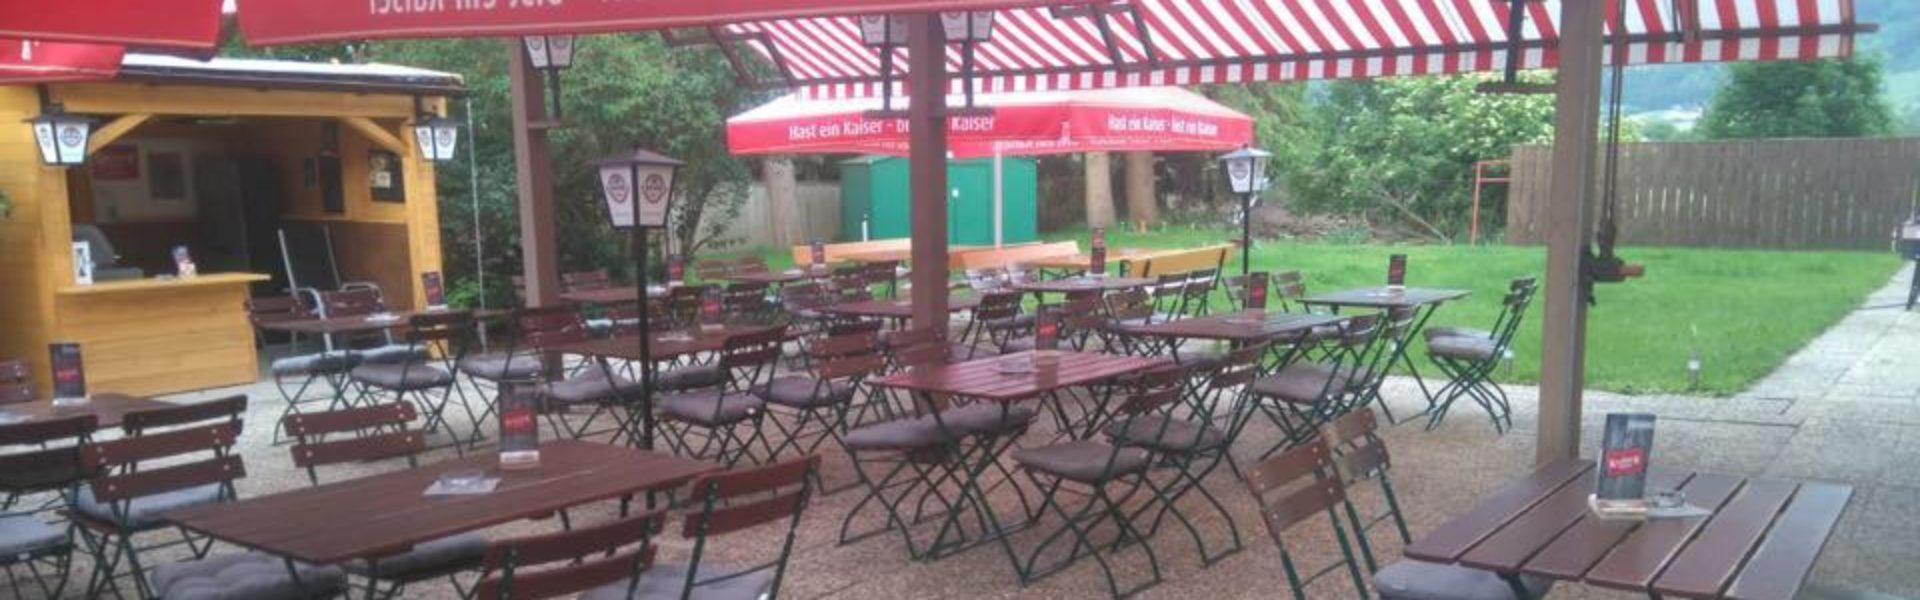 Café Edelweiß